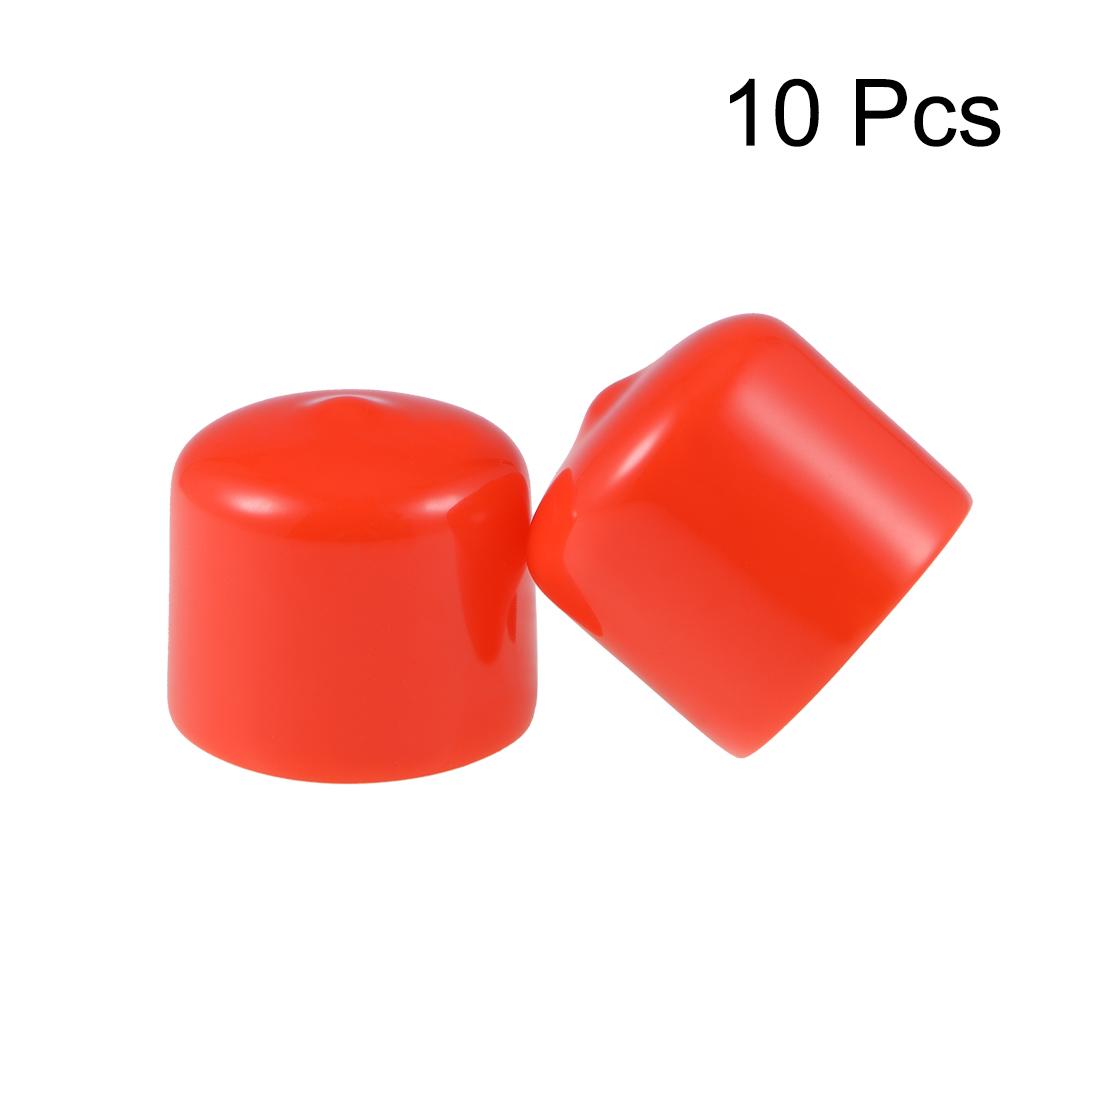 uxcell 5Pcs 24mm Inner Dia PVC Flexible Vinyl End Cap Screw Thread Protector Cover Red